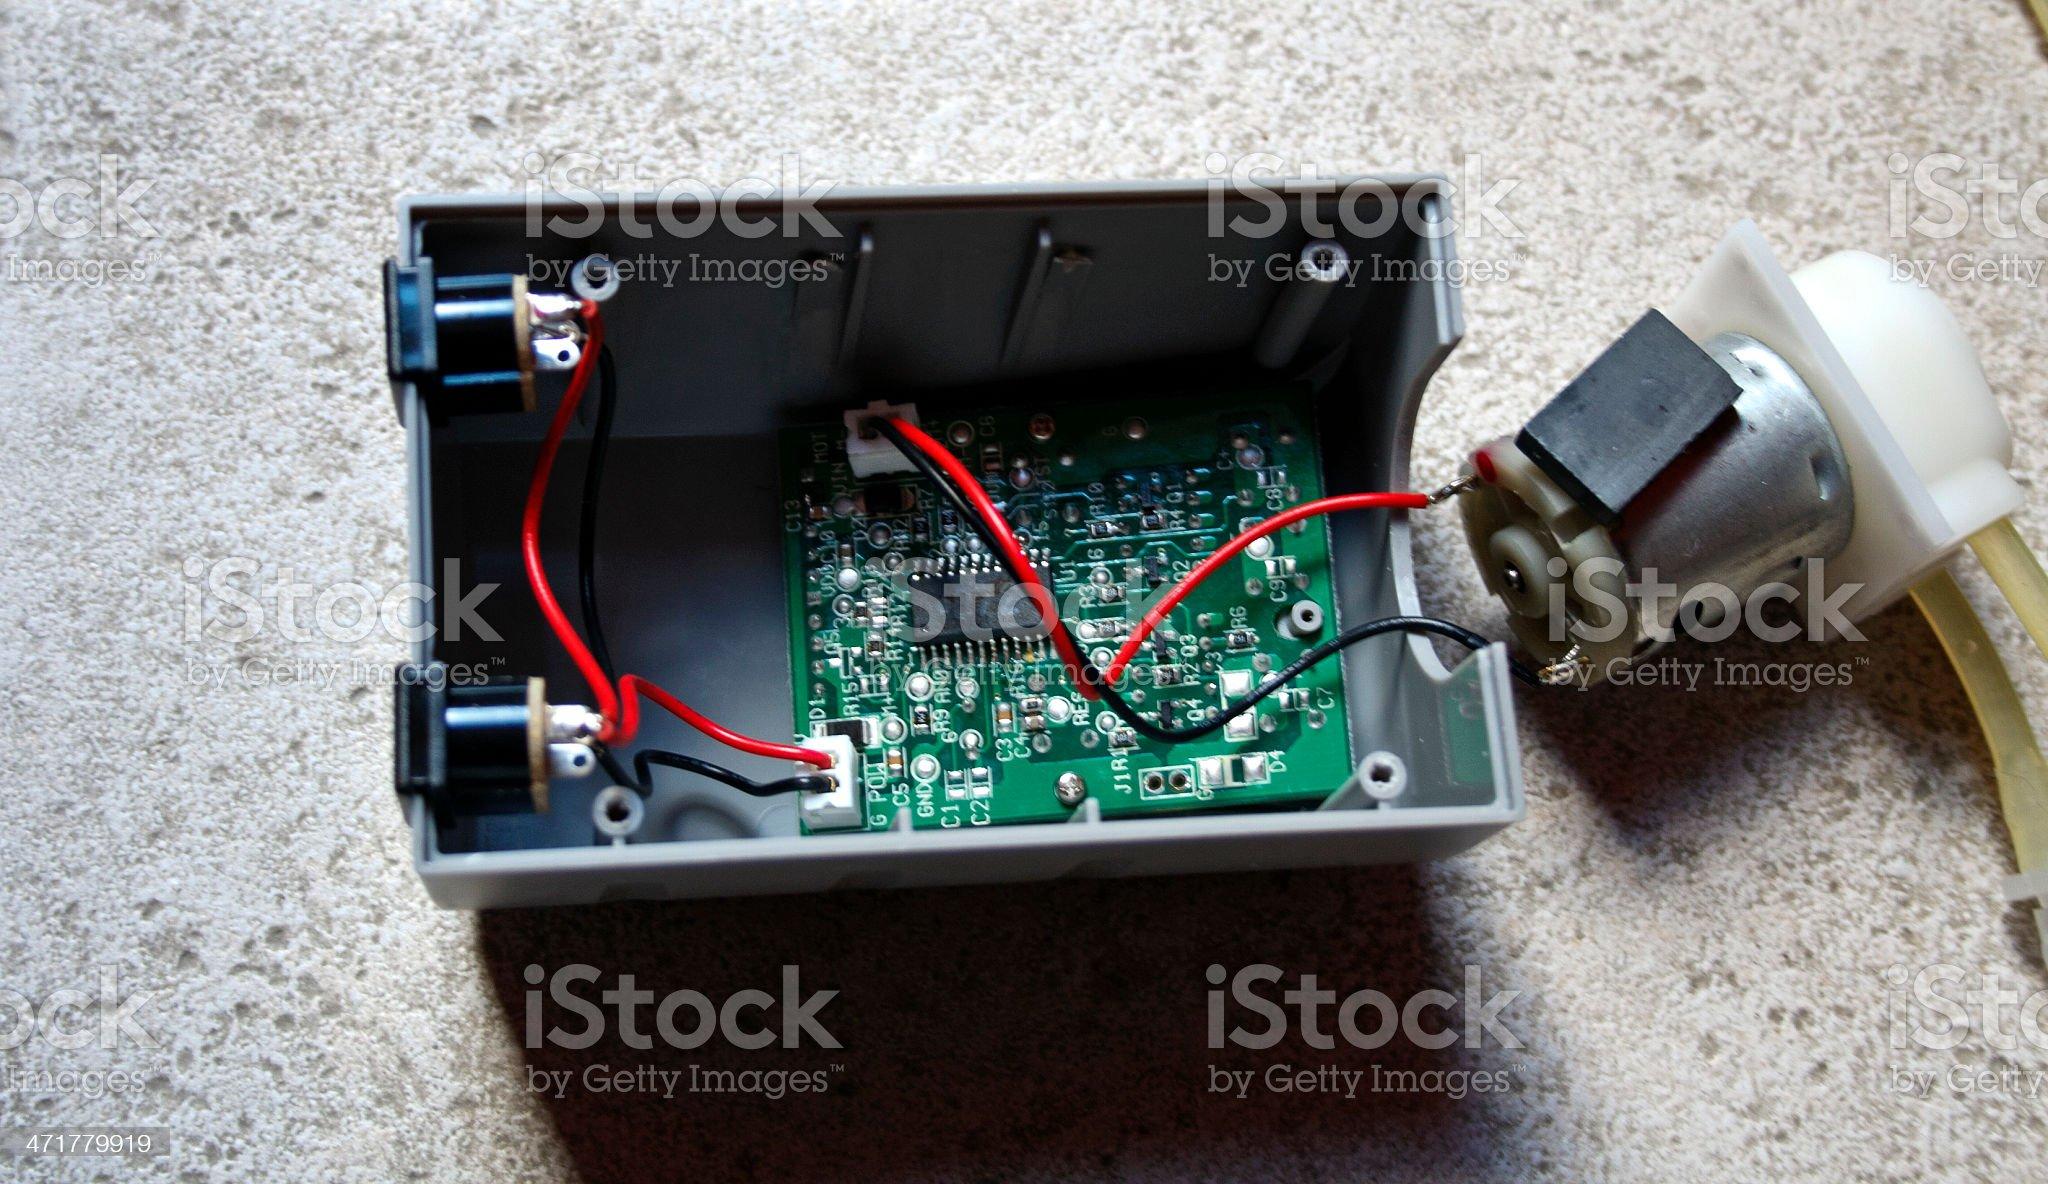 Repairing elecrtonics royalty-free stock photo